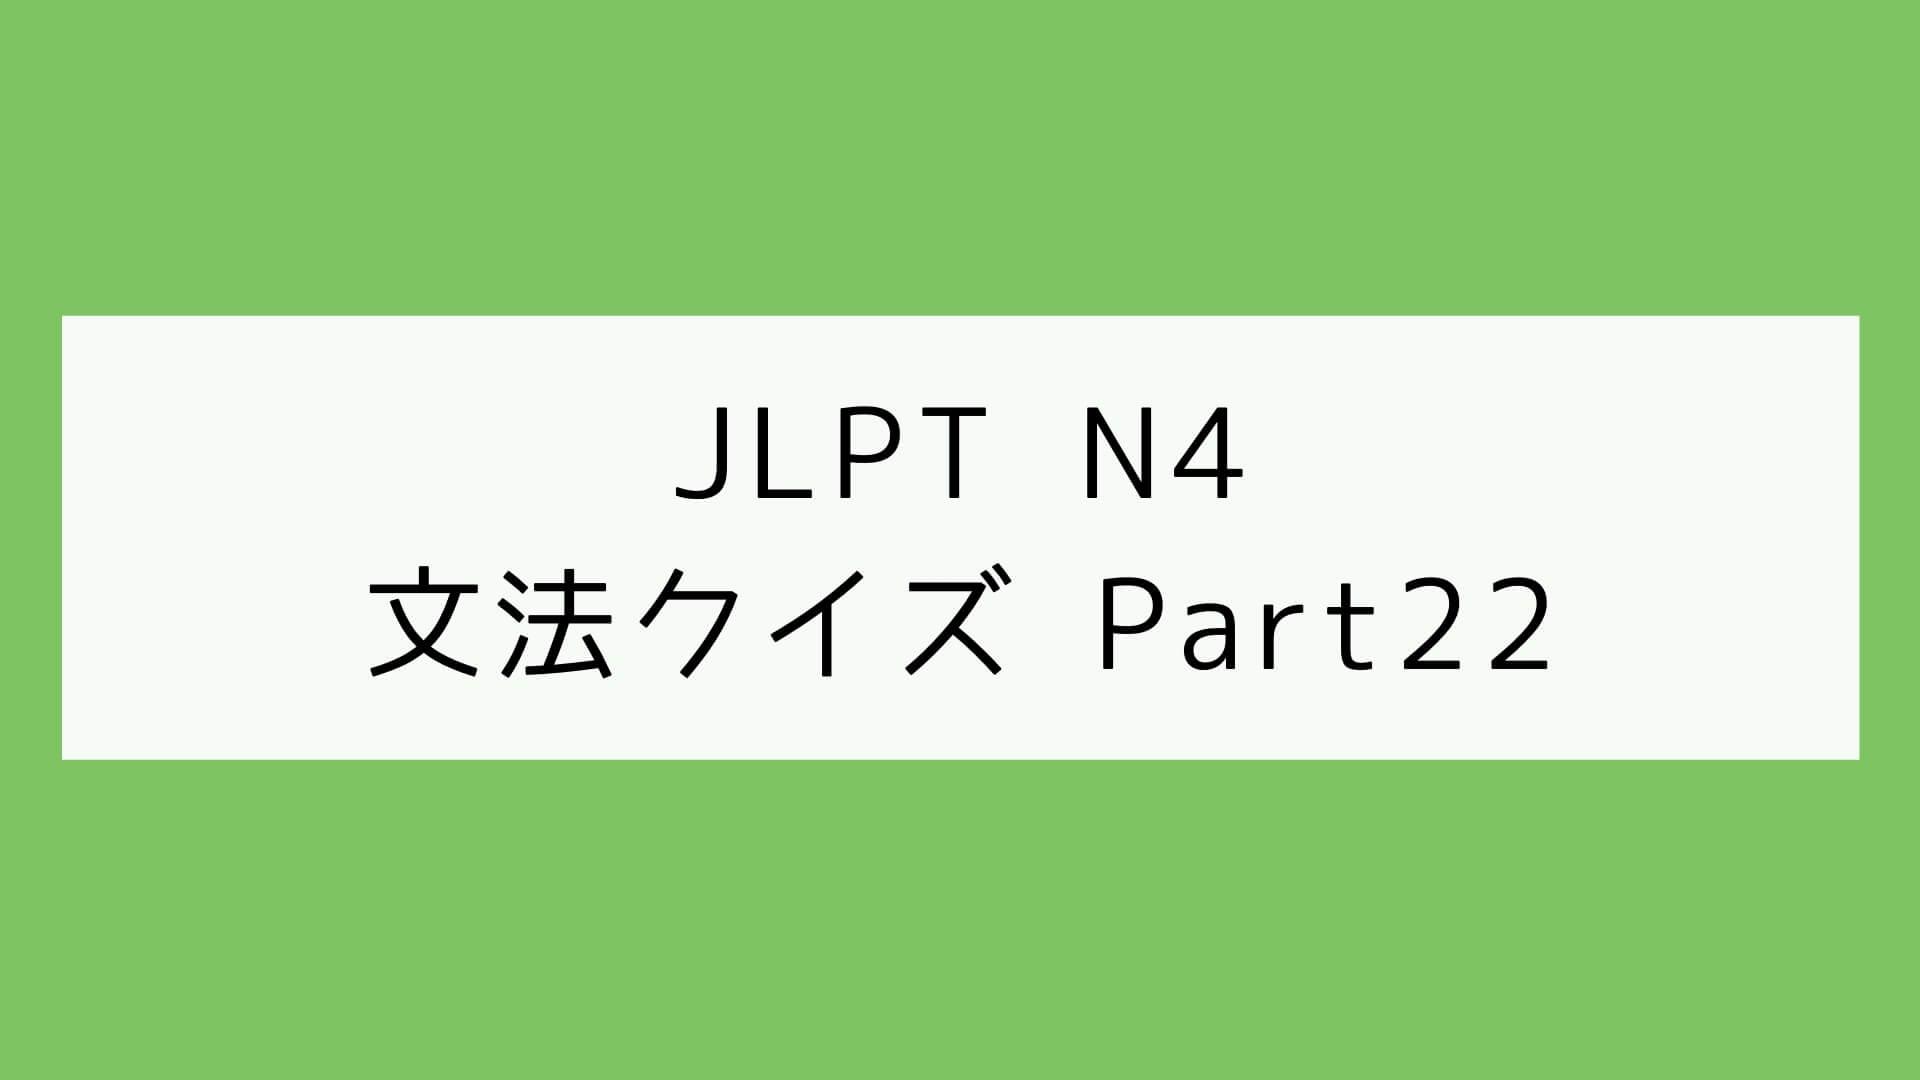 【JLPT N4】文法クイズ Part22